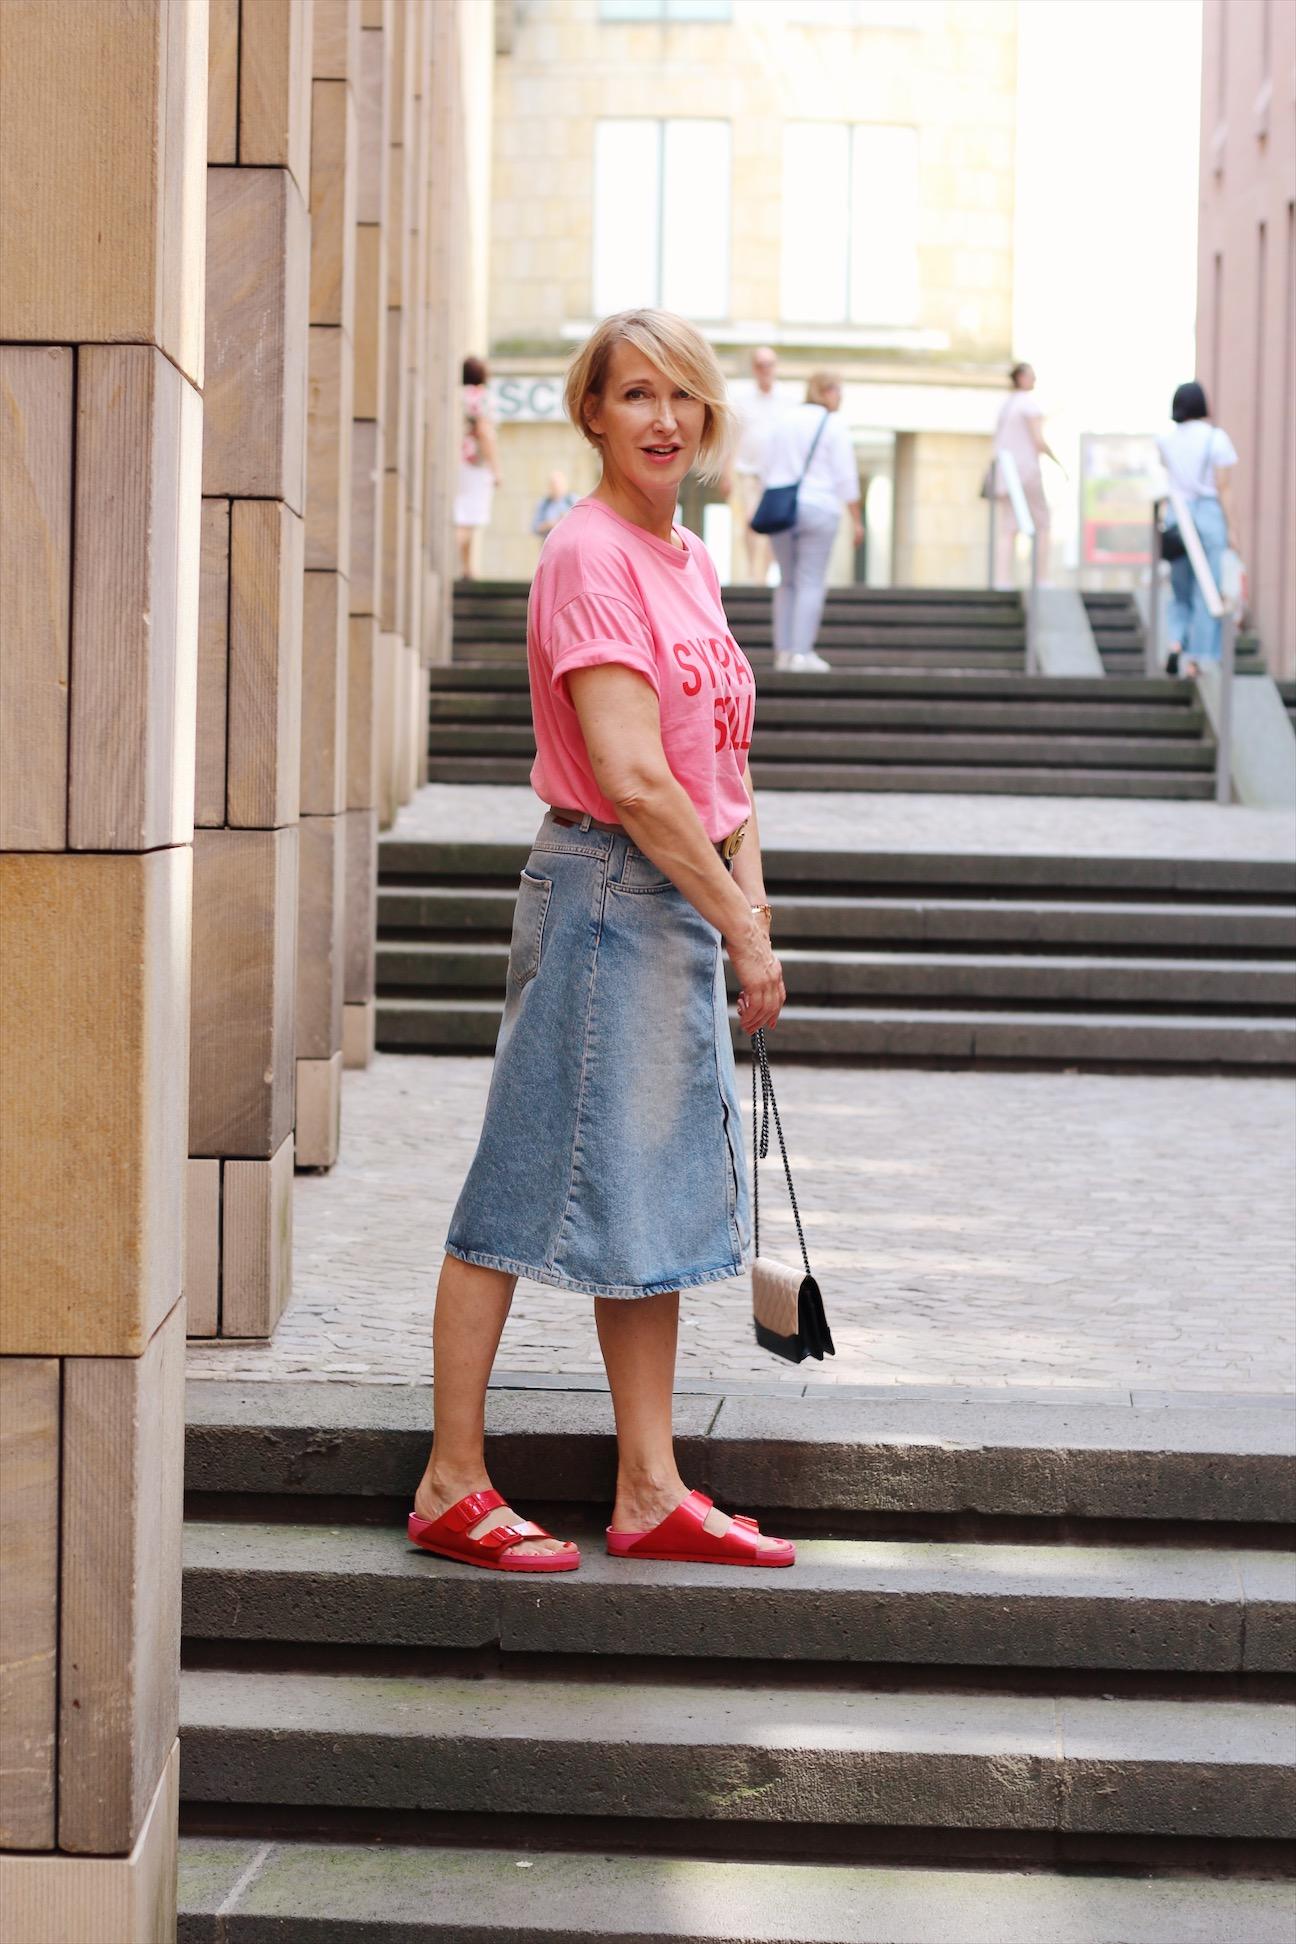 glamupyourlifestyle jeansrock Birkenstock Sommerlook frankfurter-altstadt ue-40-blog ue-50-blog ü-40-blog